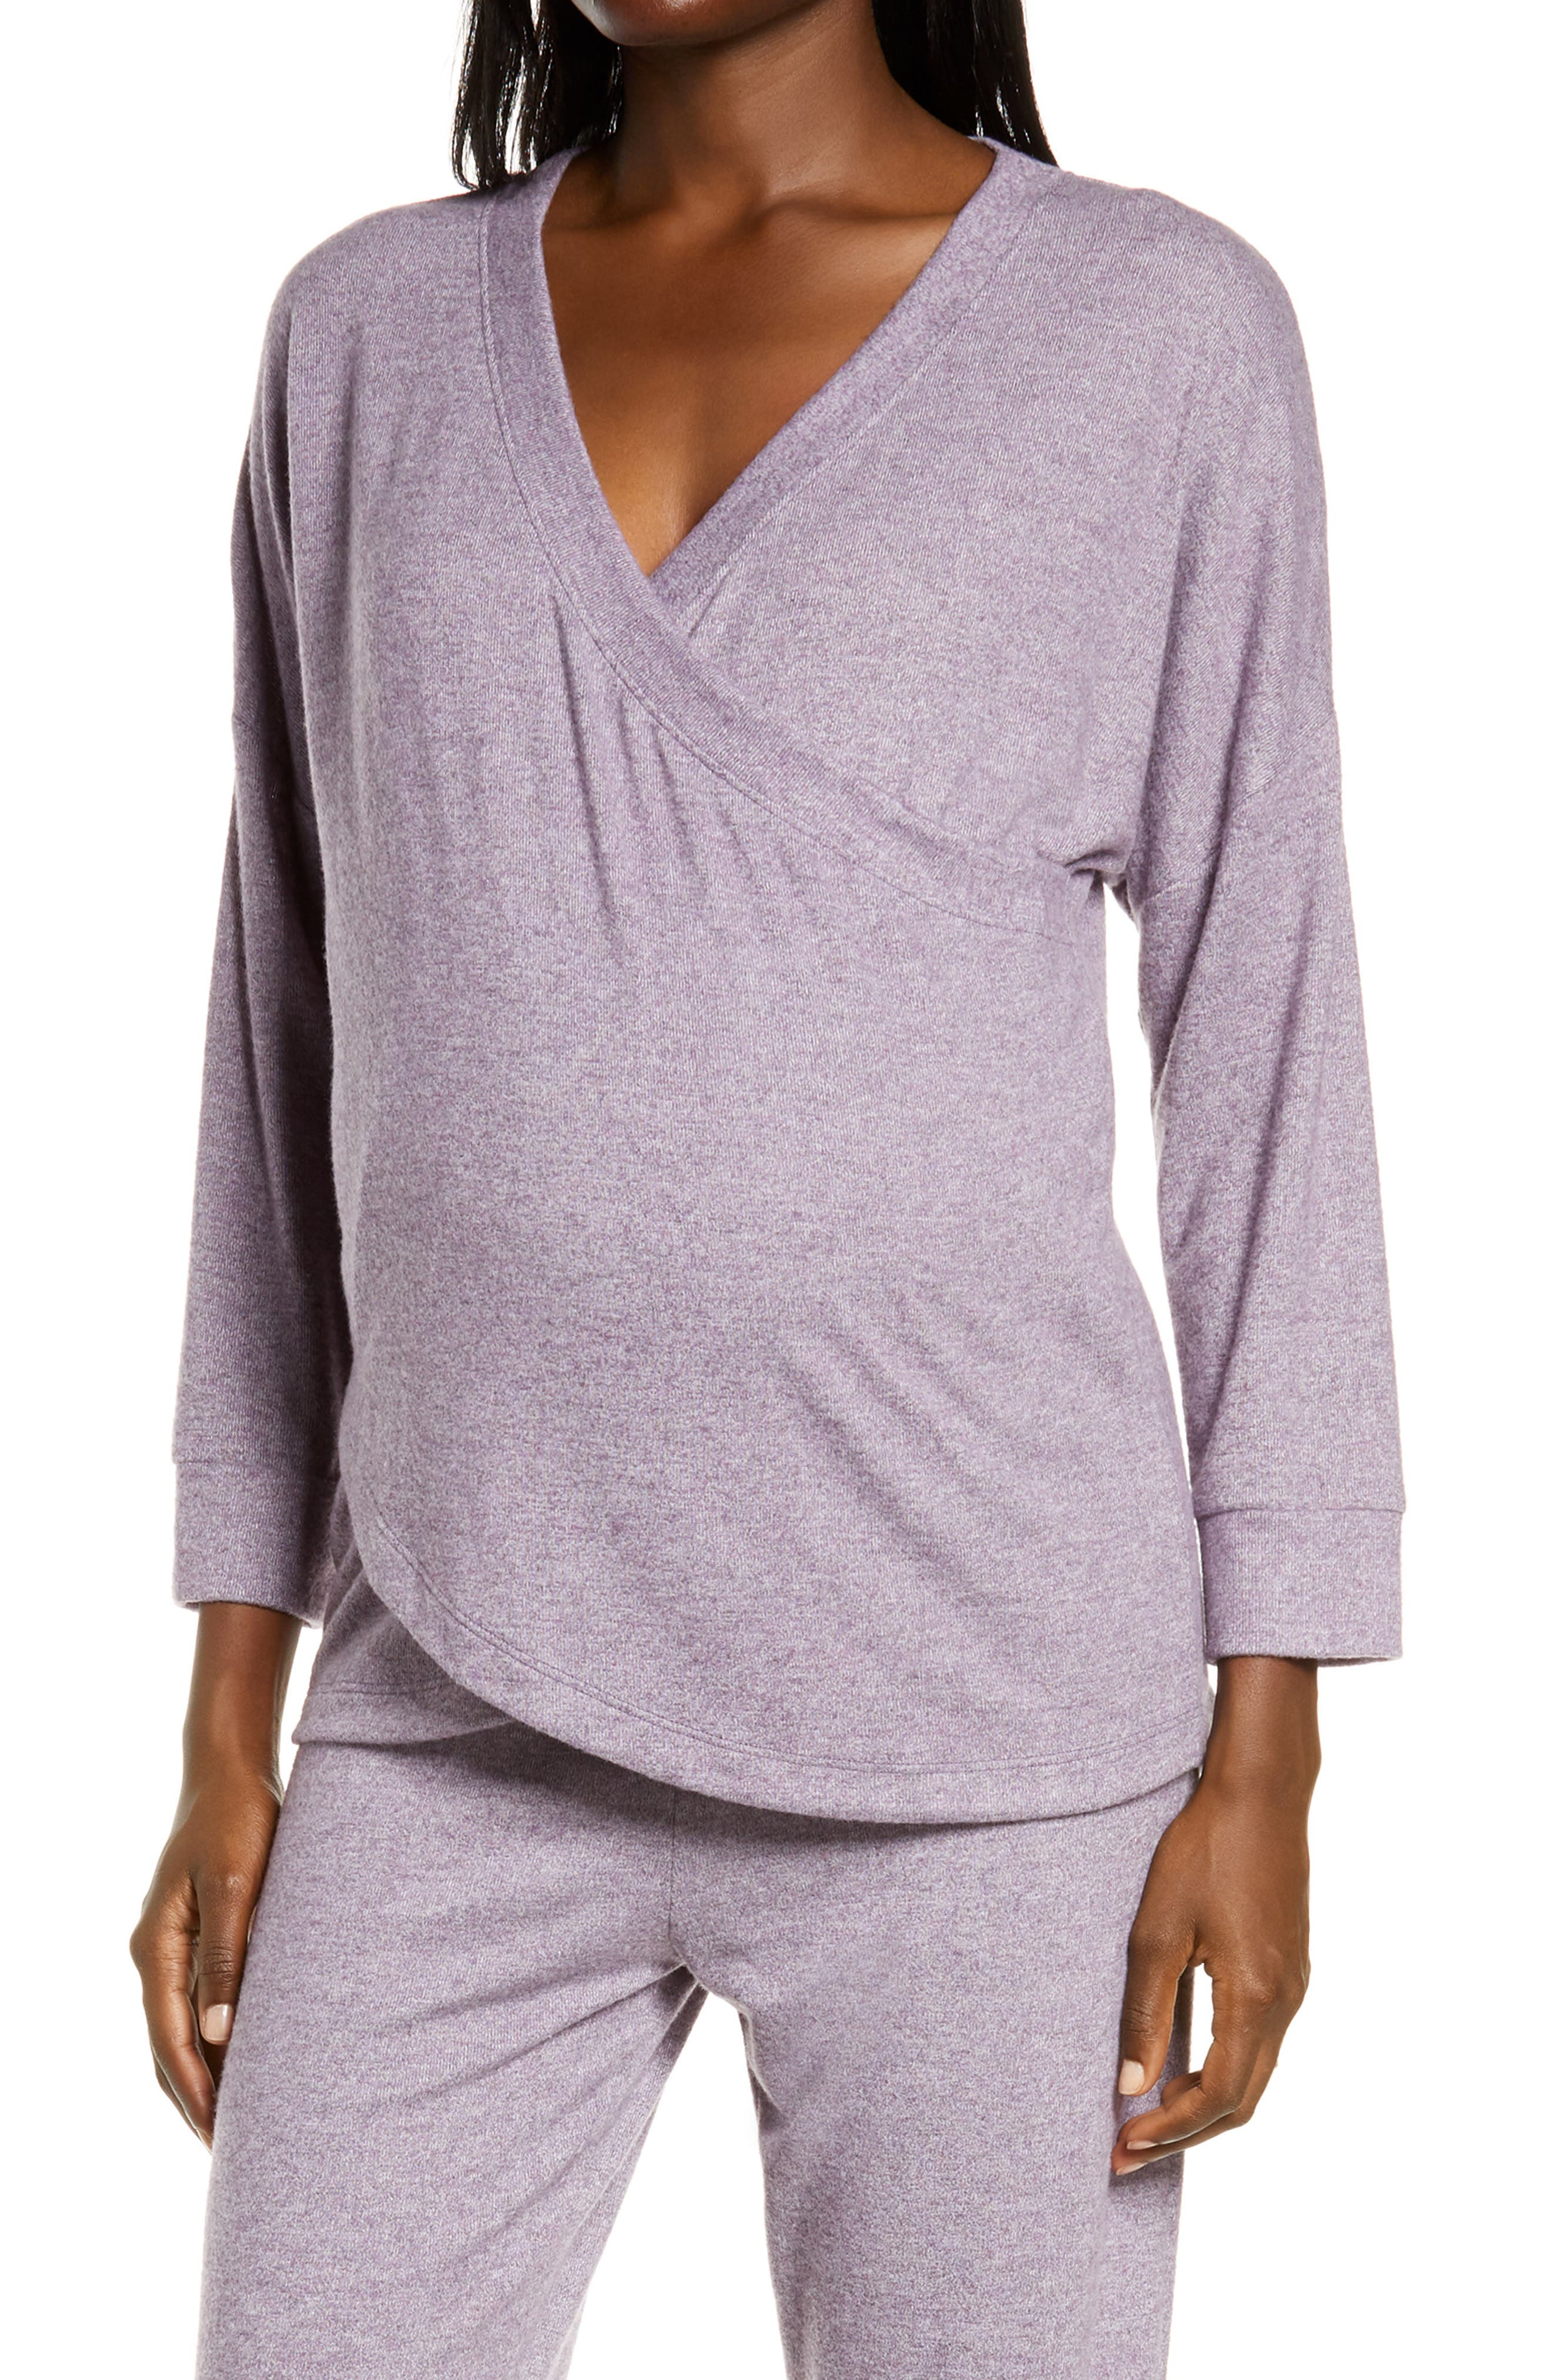 Anytime Nursing/maternity Sweatshirt